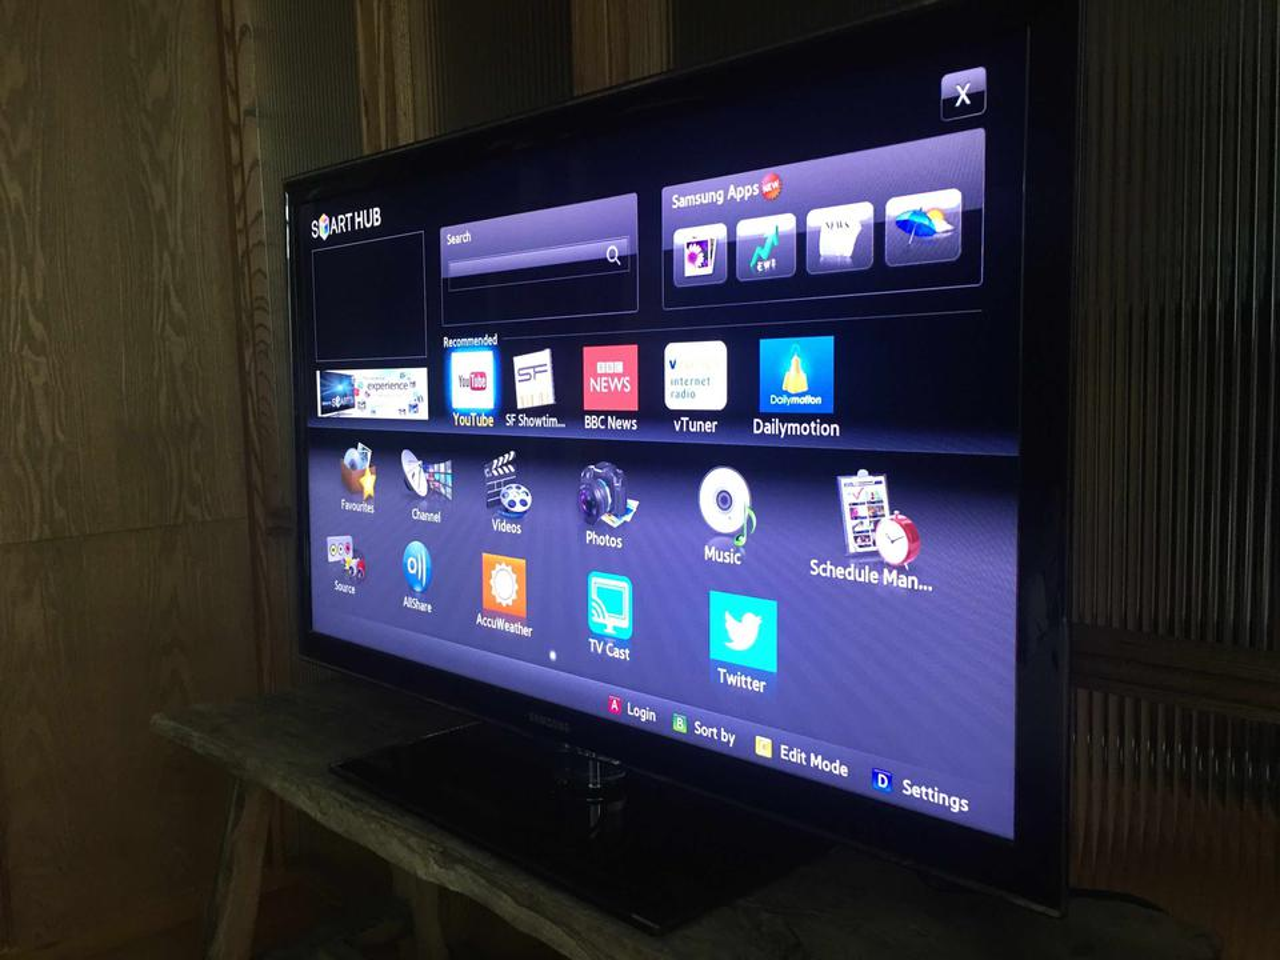 SAMSUNG SmartTV LED 40 นิ้ว รูปที่ 3